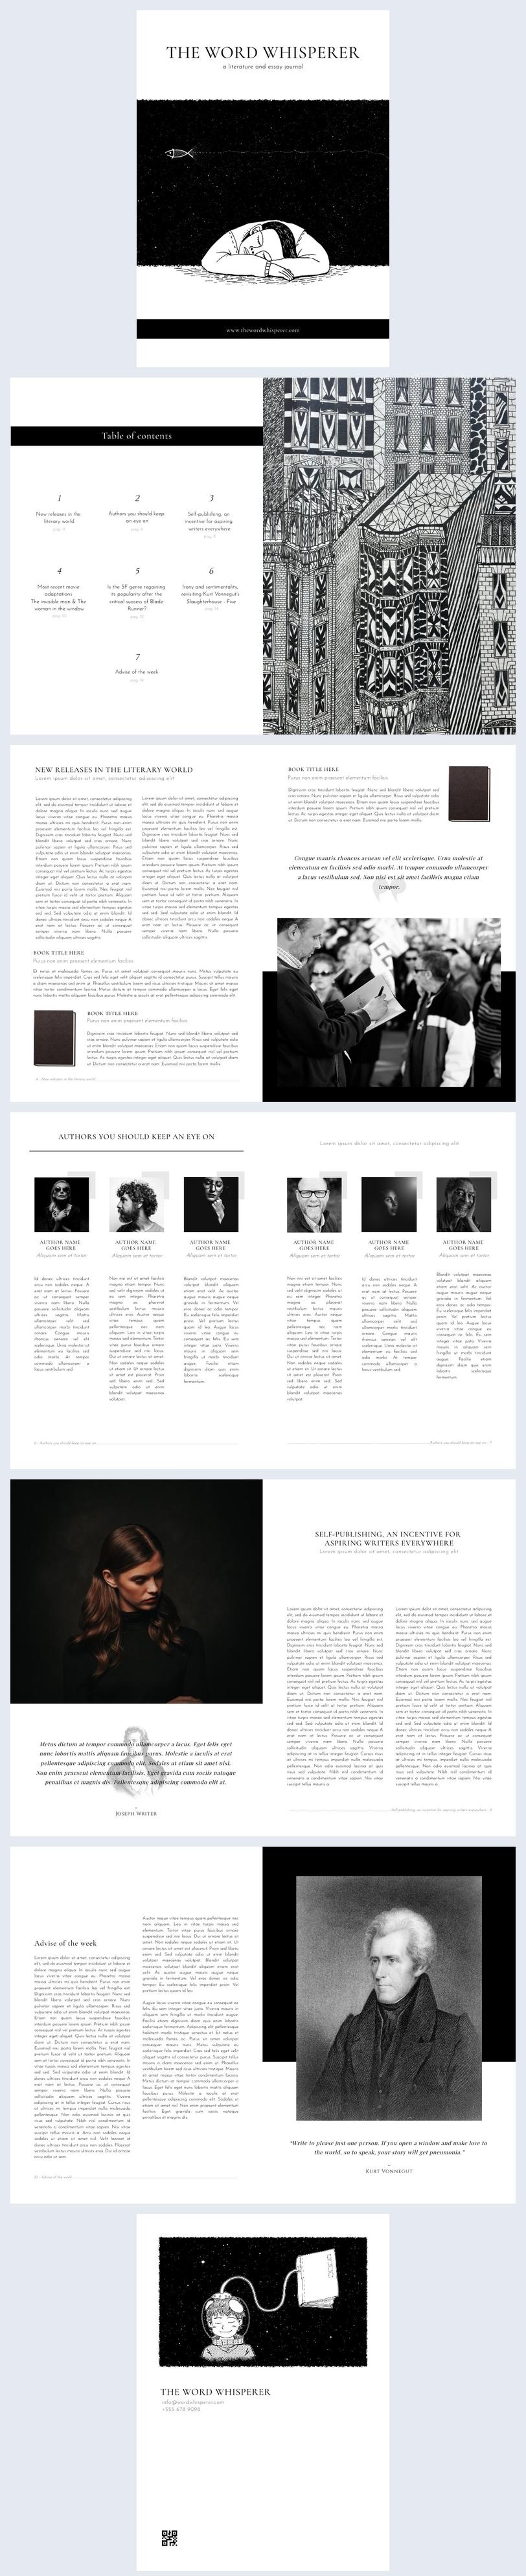 Diseño para revista literaria